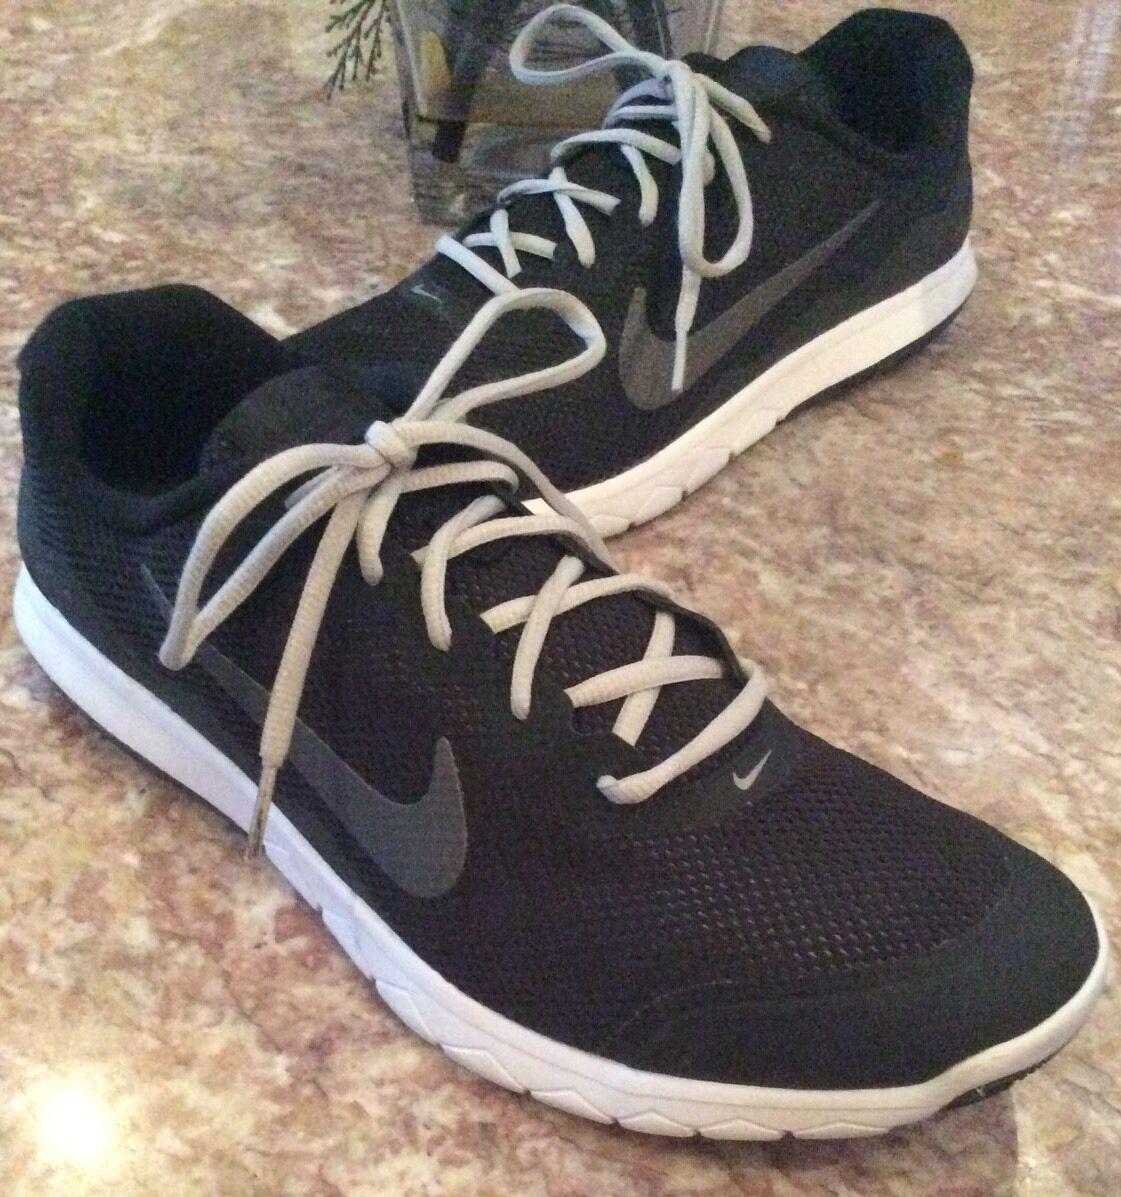 NIKE Flex Experience RN 4 Men's Black White Running shoes Sz 12, 749172-001 EUC